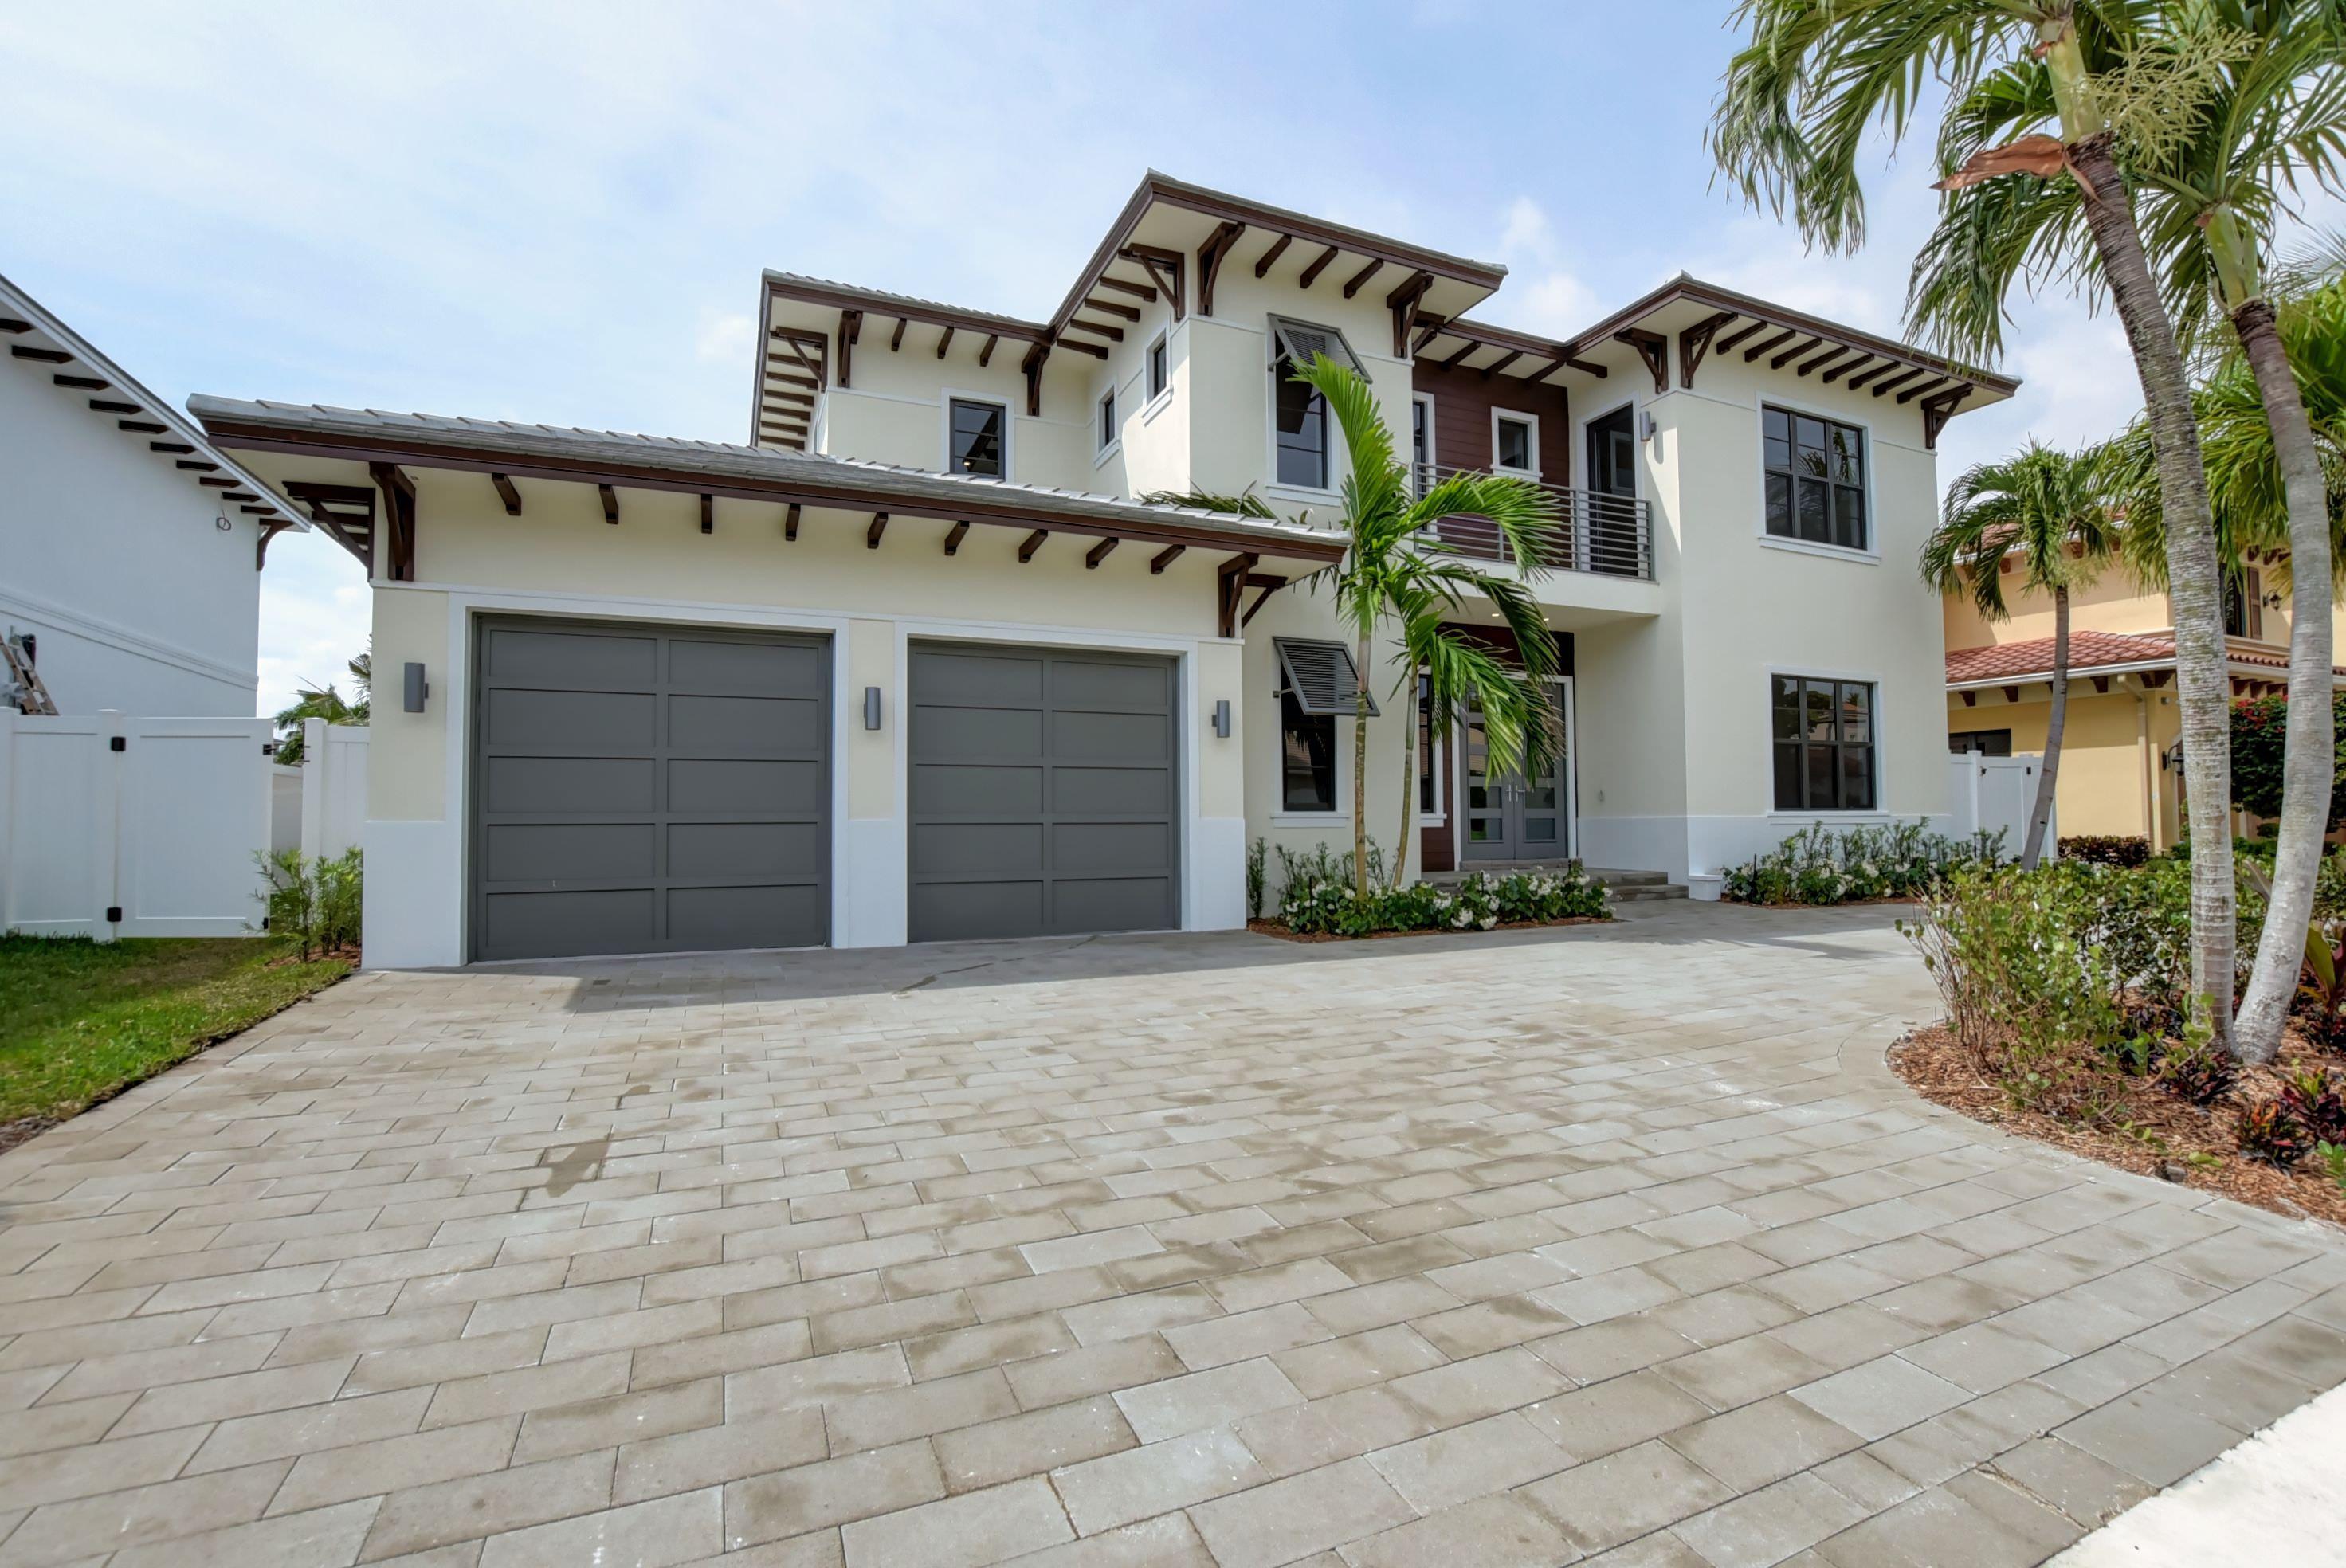 Home for sale in Boca Harbour Boca Raton Florida